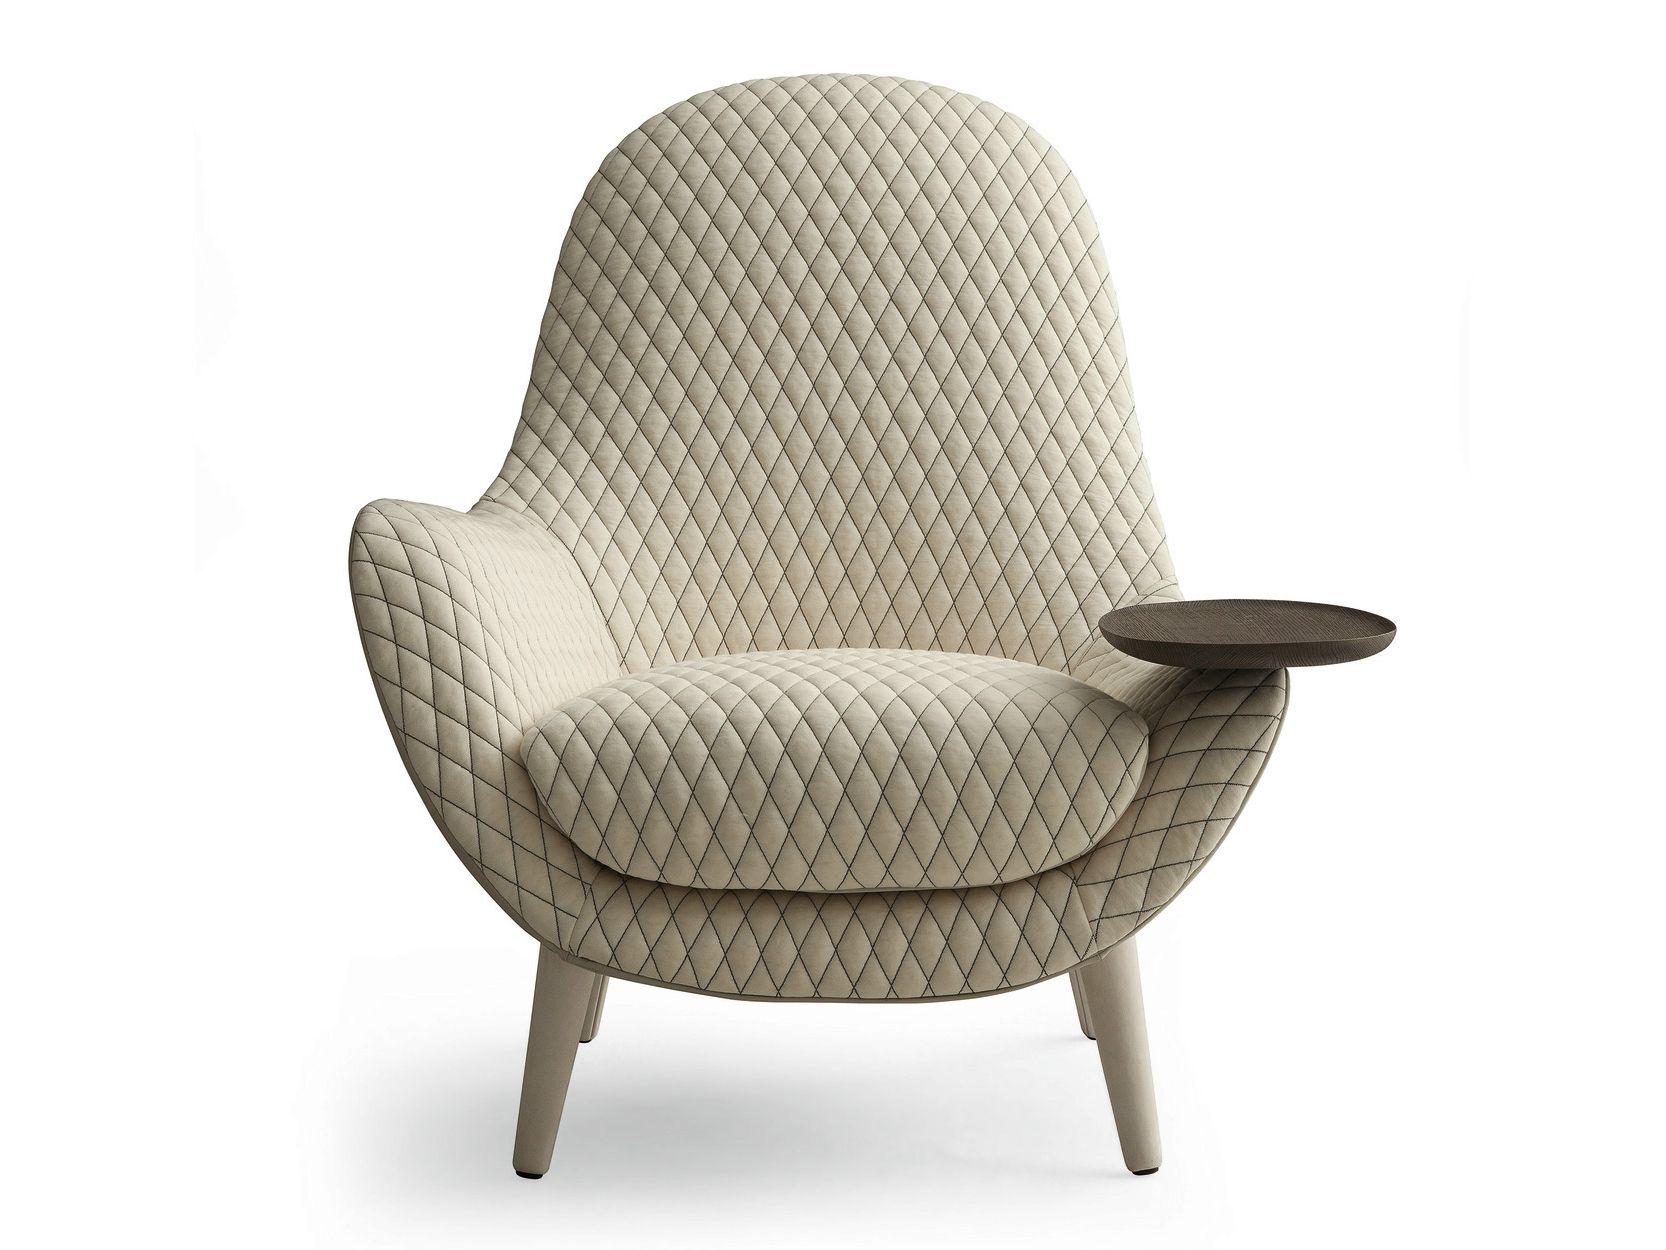 Furniture swivel and tub chairs dori fabric swivel cuddle chair - Fabrics